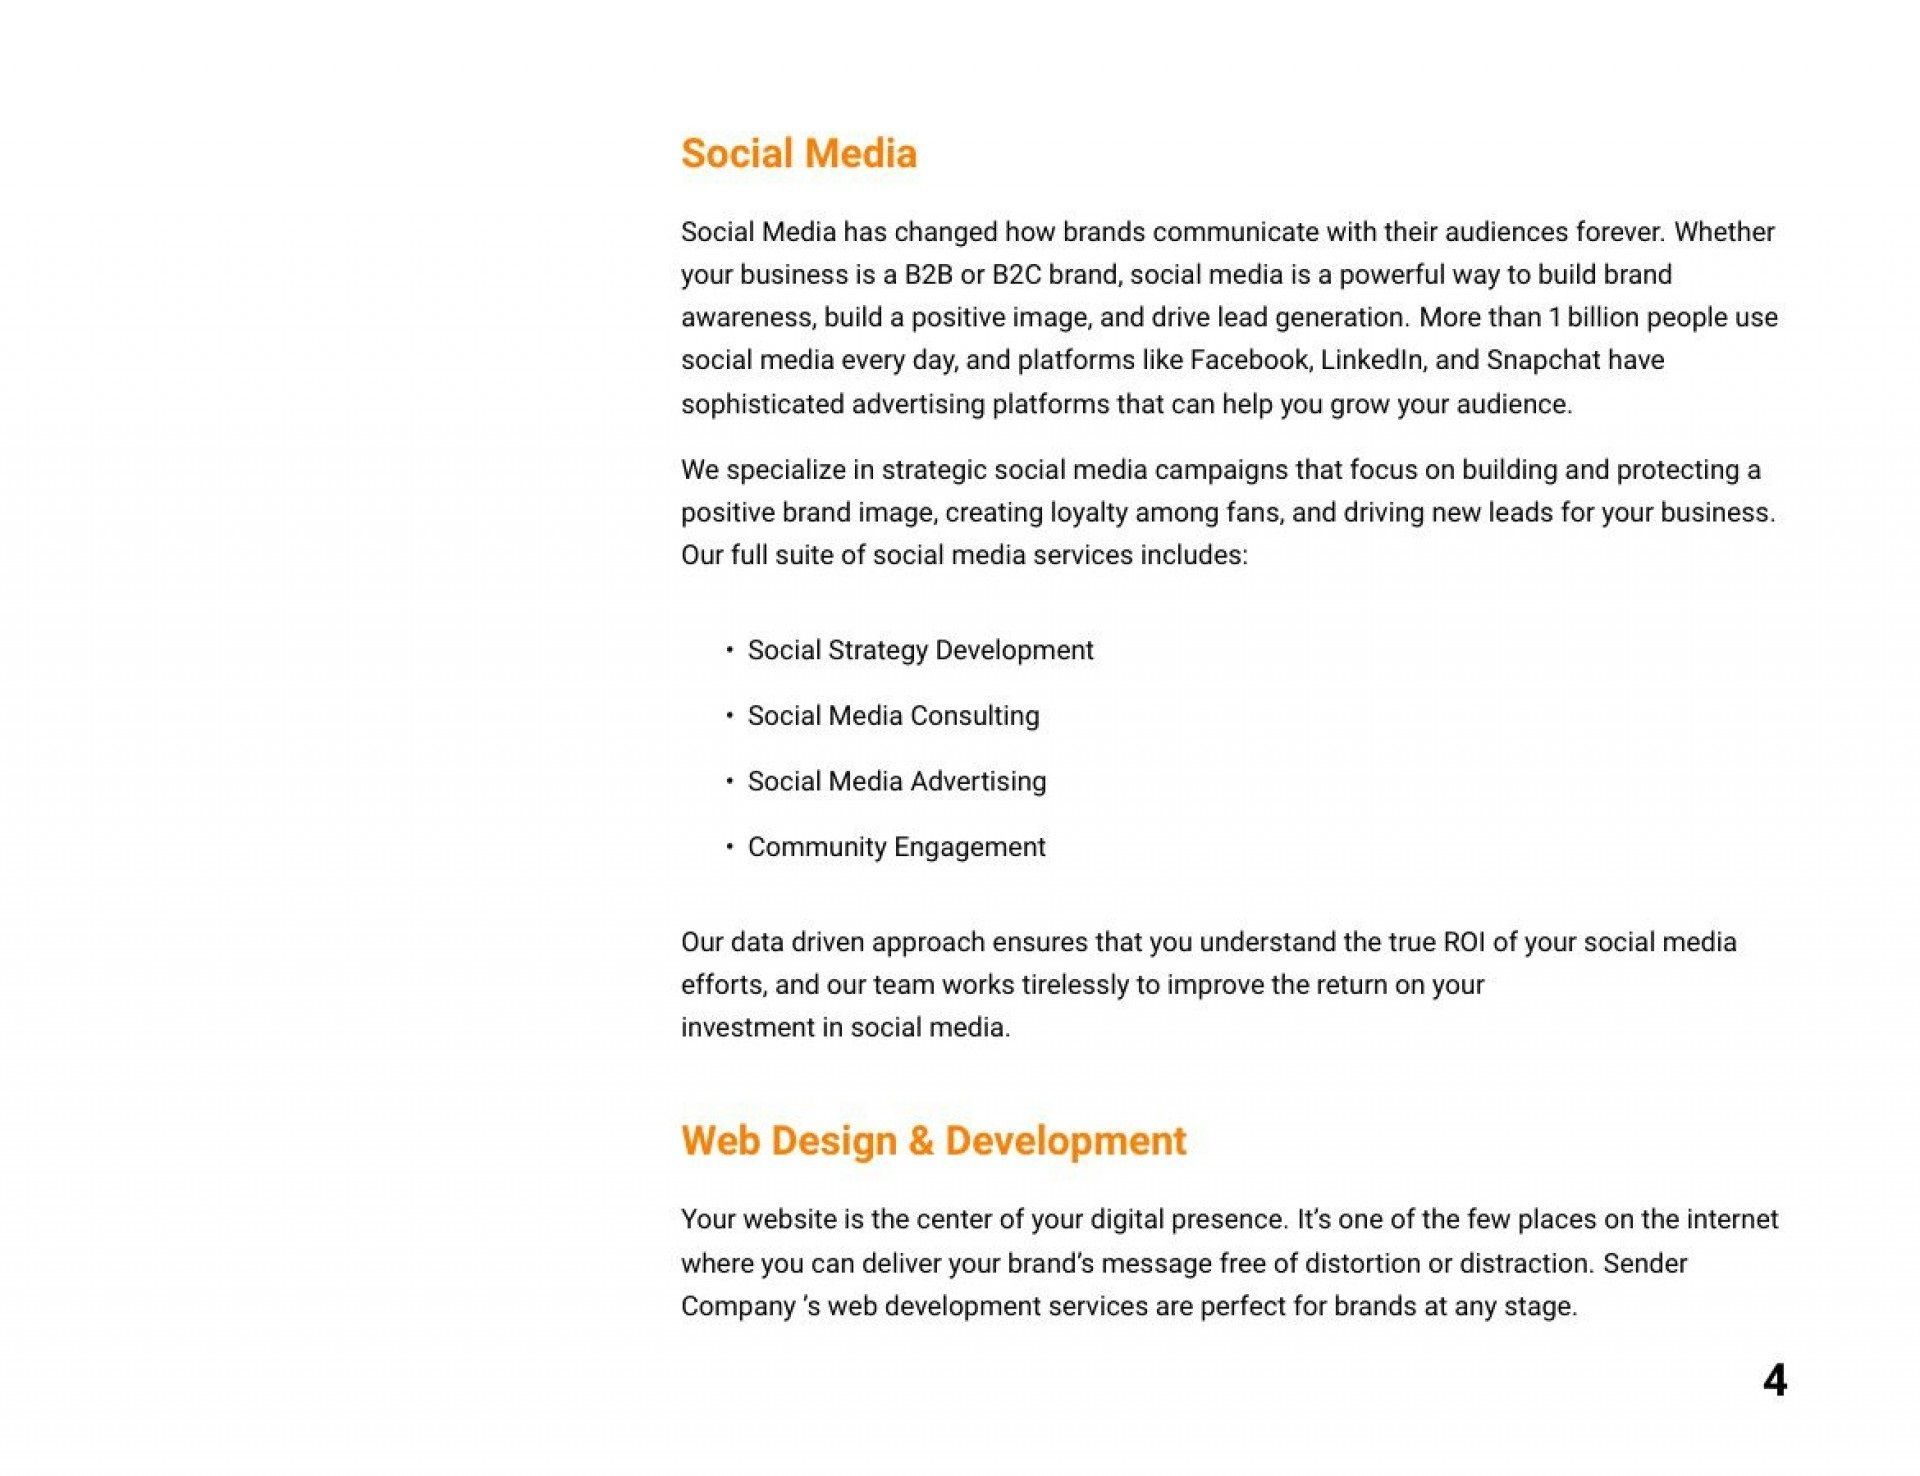 008 Frightening Digital Marketing Busines Plan Sample Concept  Template1920